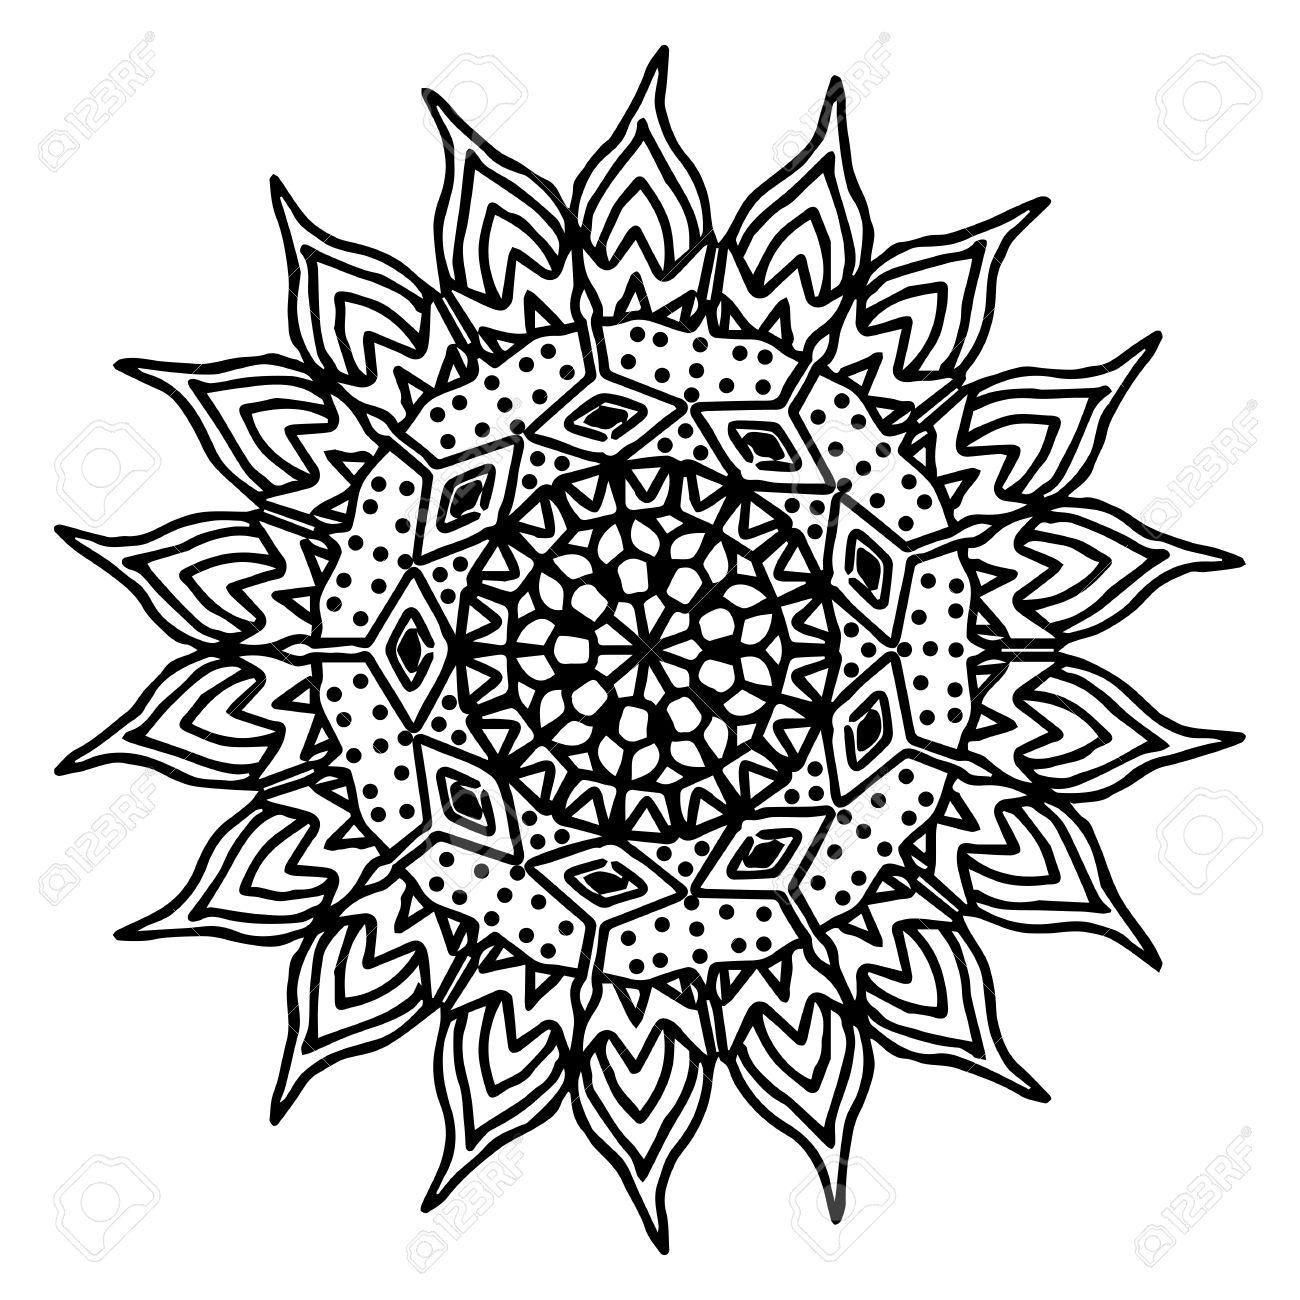 Sun Hand Drawing Doodling Mandala Coloring Page Isolated Royalty